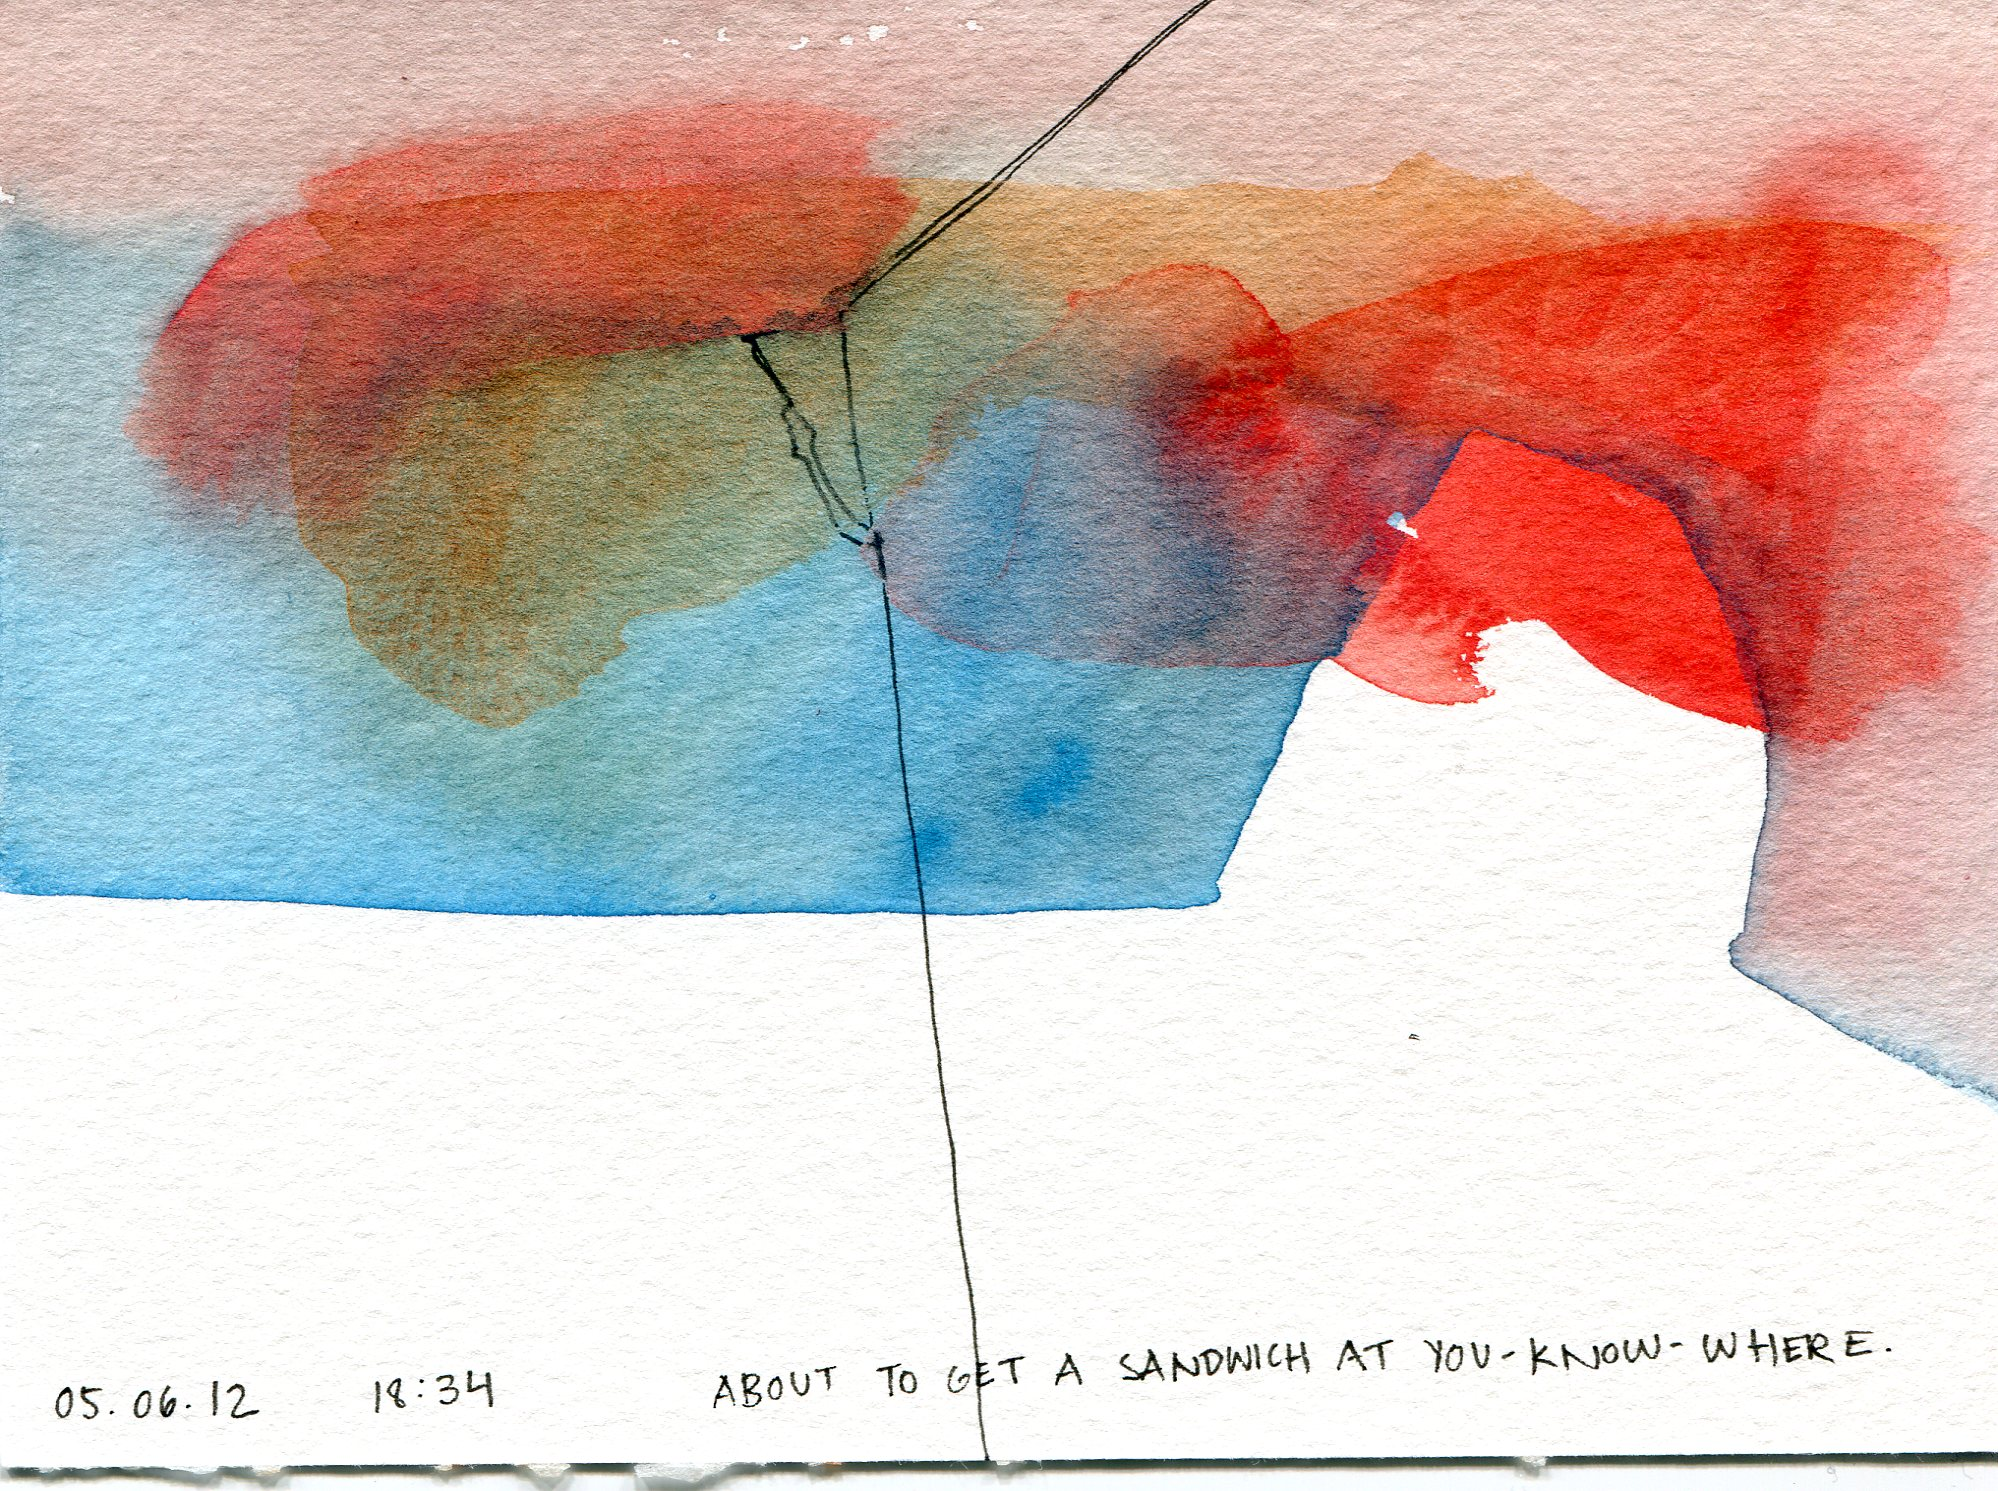 2012-05-12 drawing001.jpg